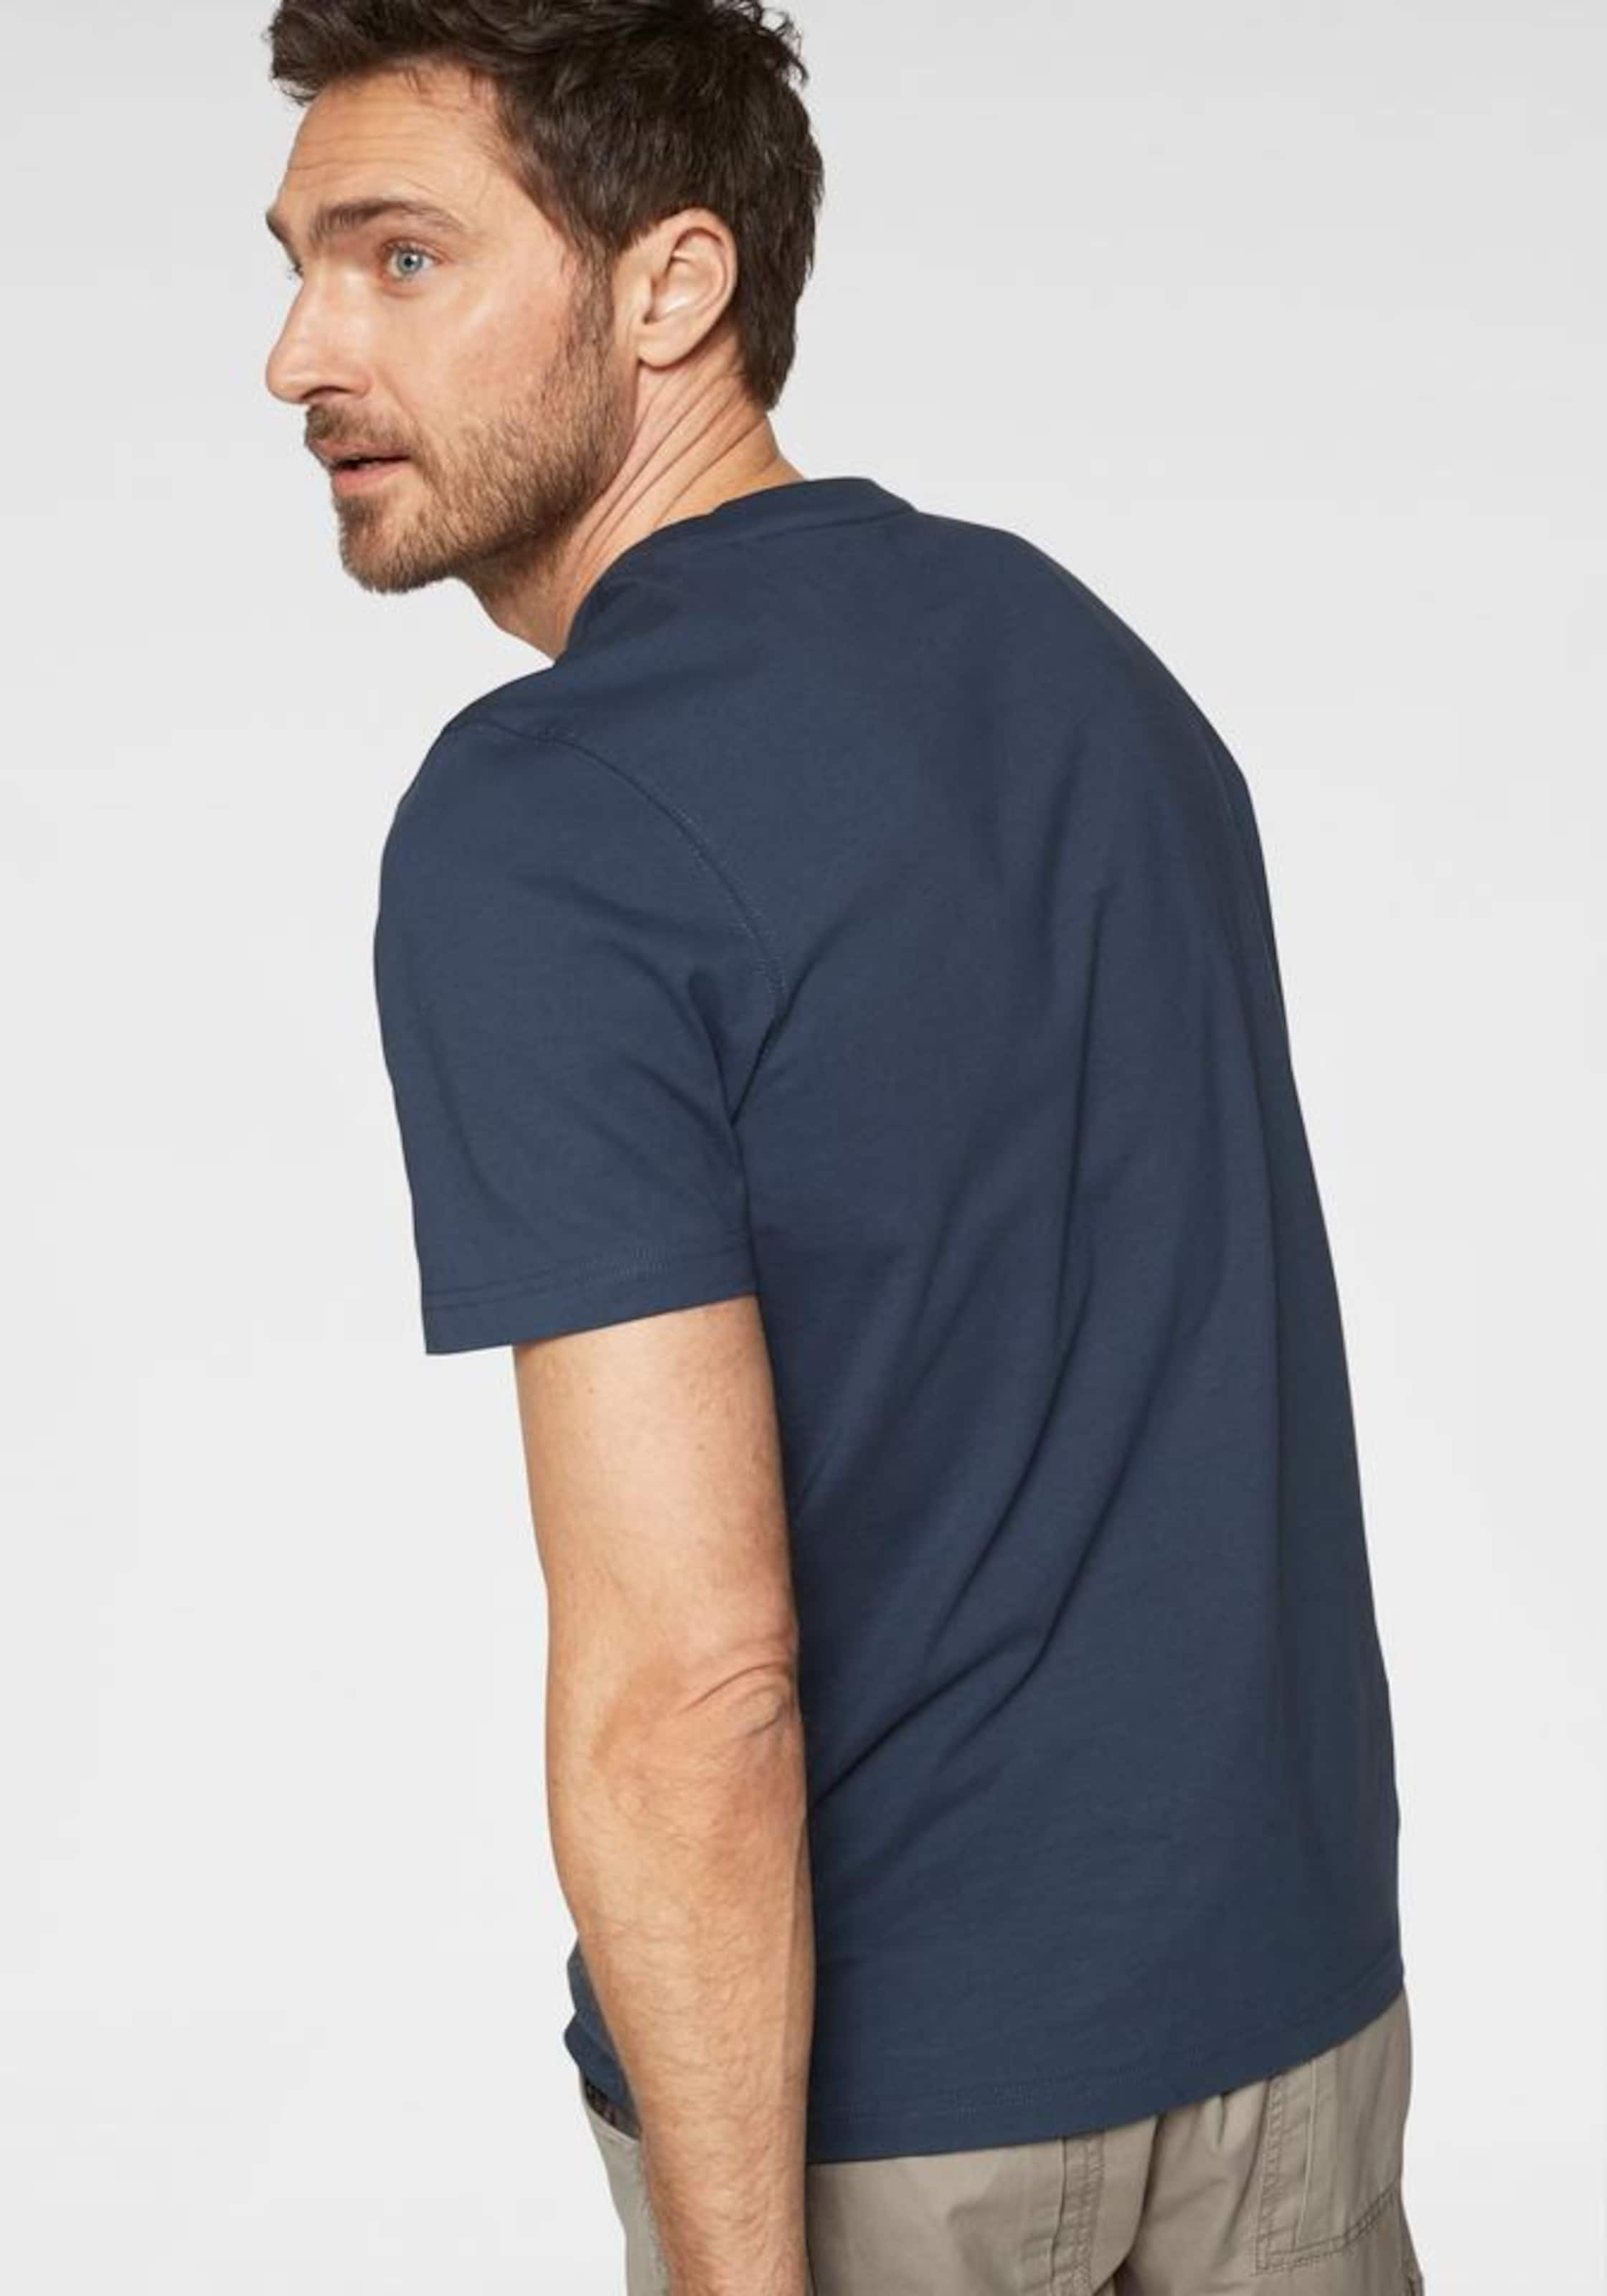 World Man's shirt T MarinePastellrot In 7fvYIb6gy